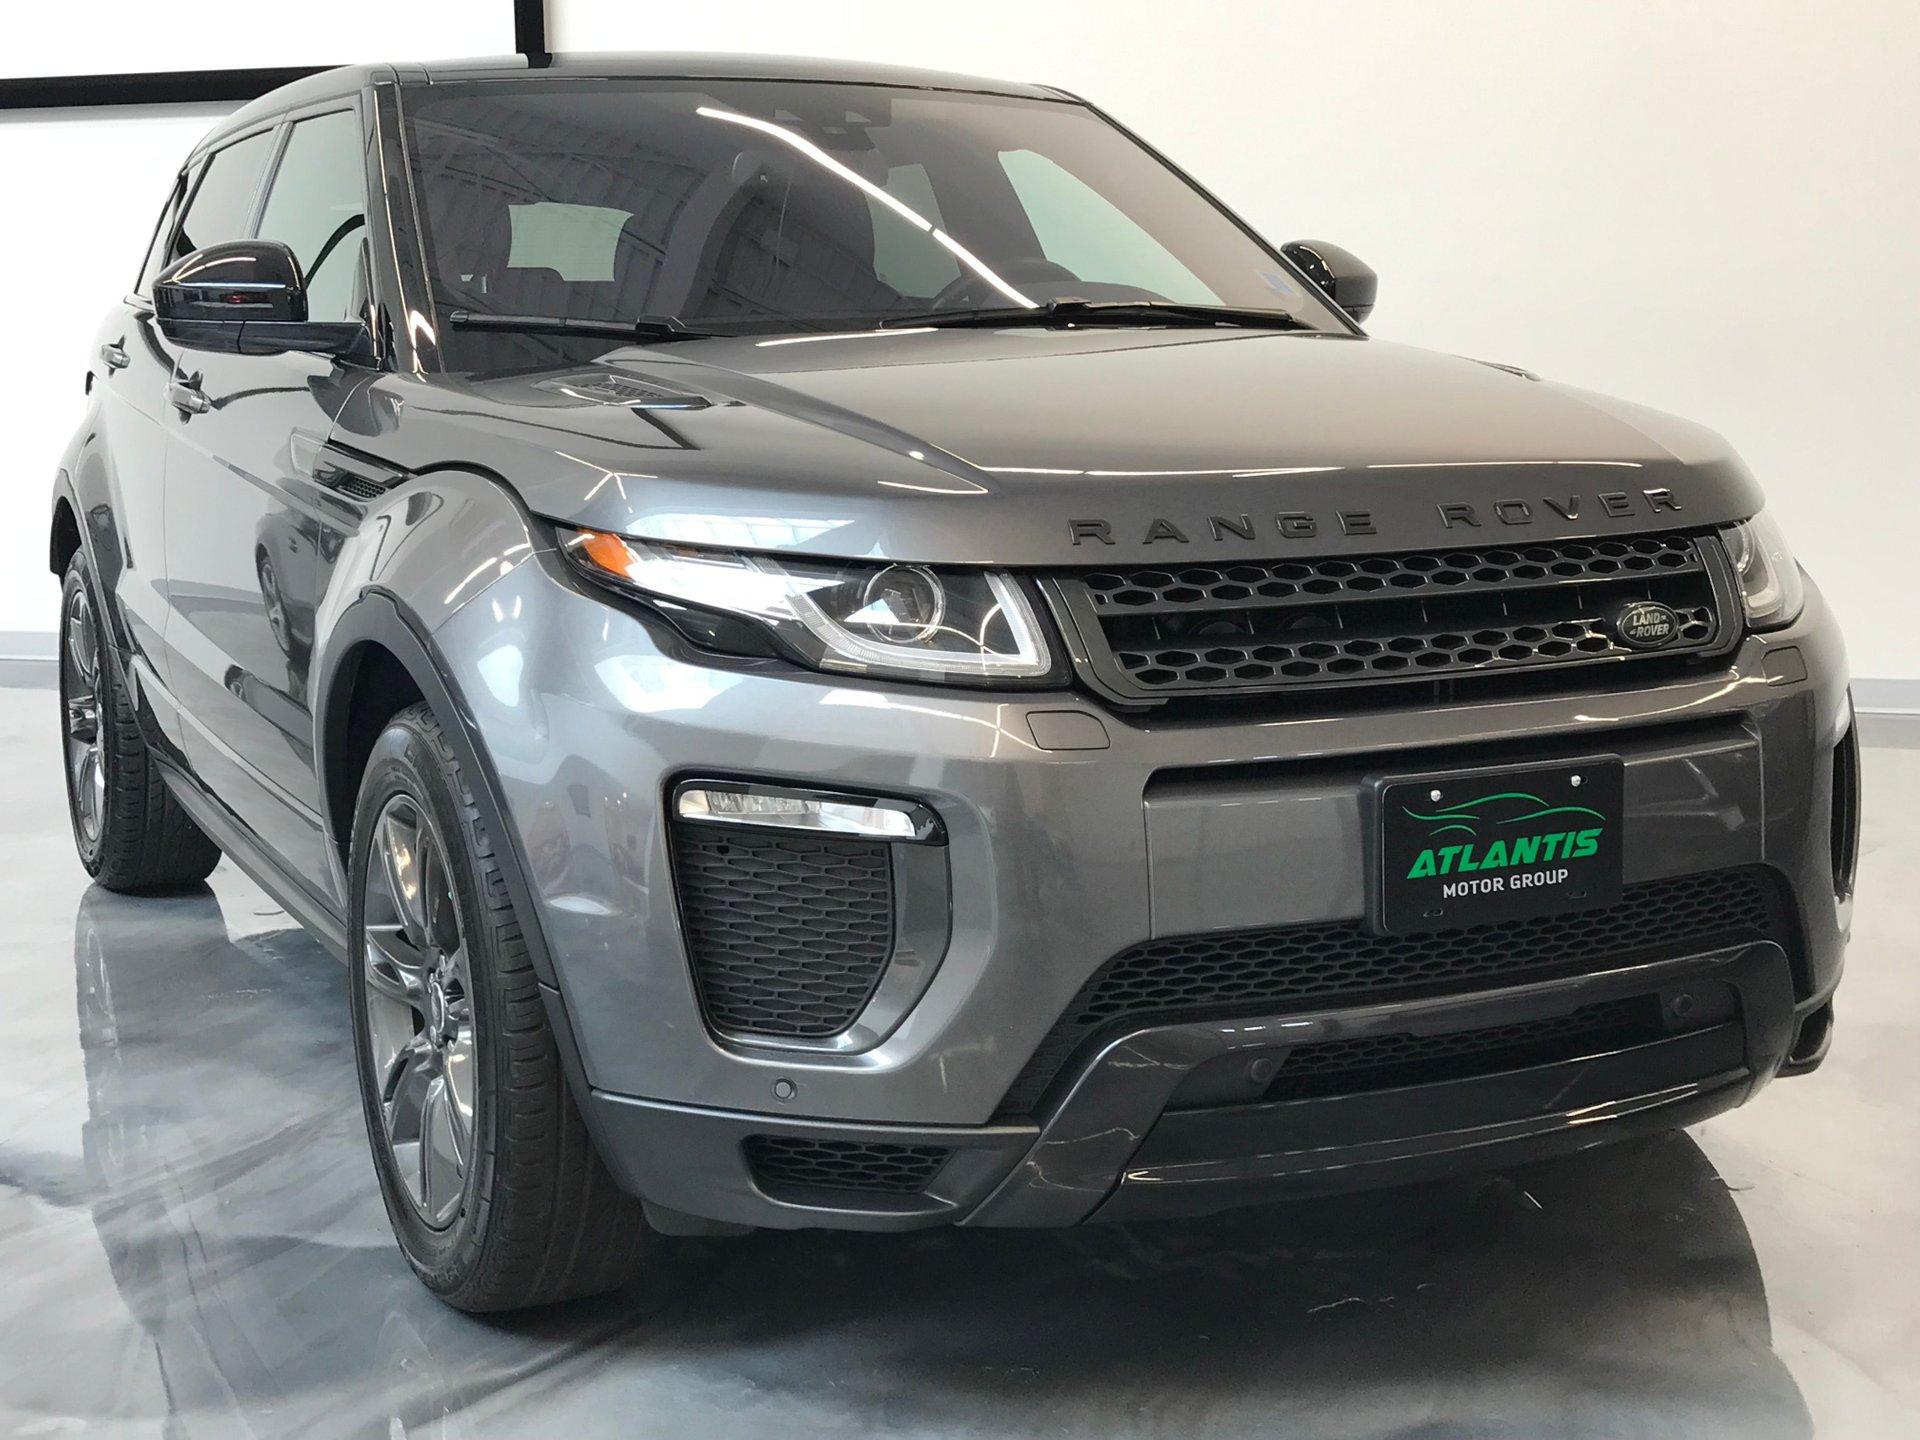 2018 range rover evoque sold